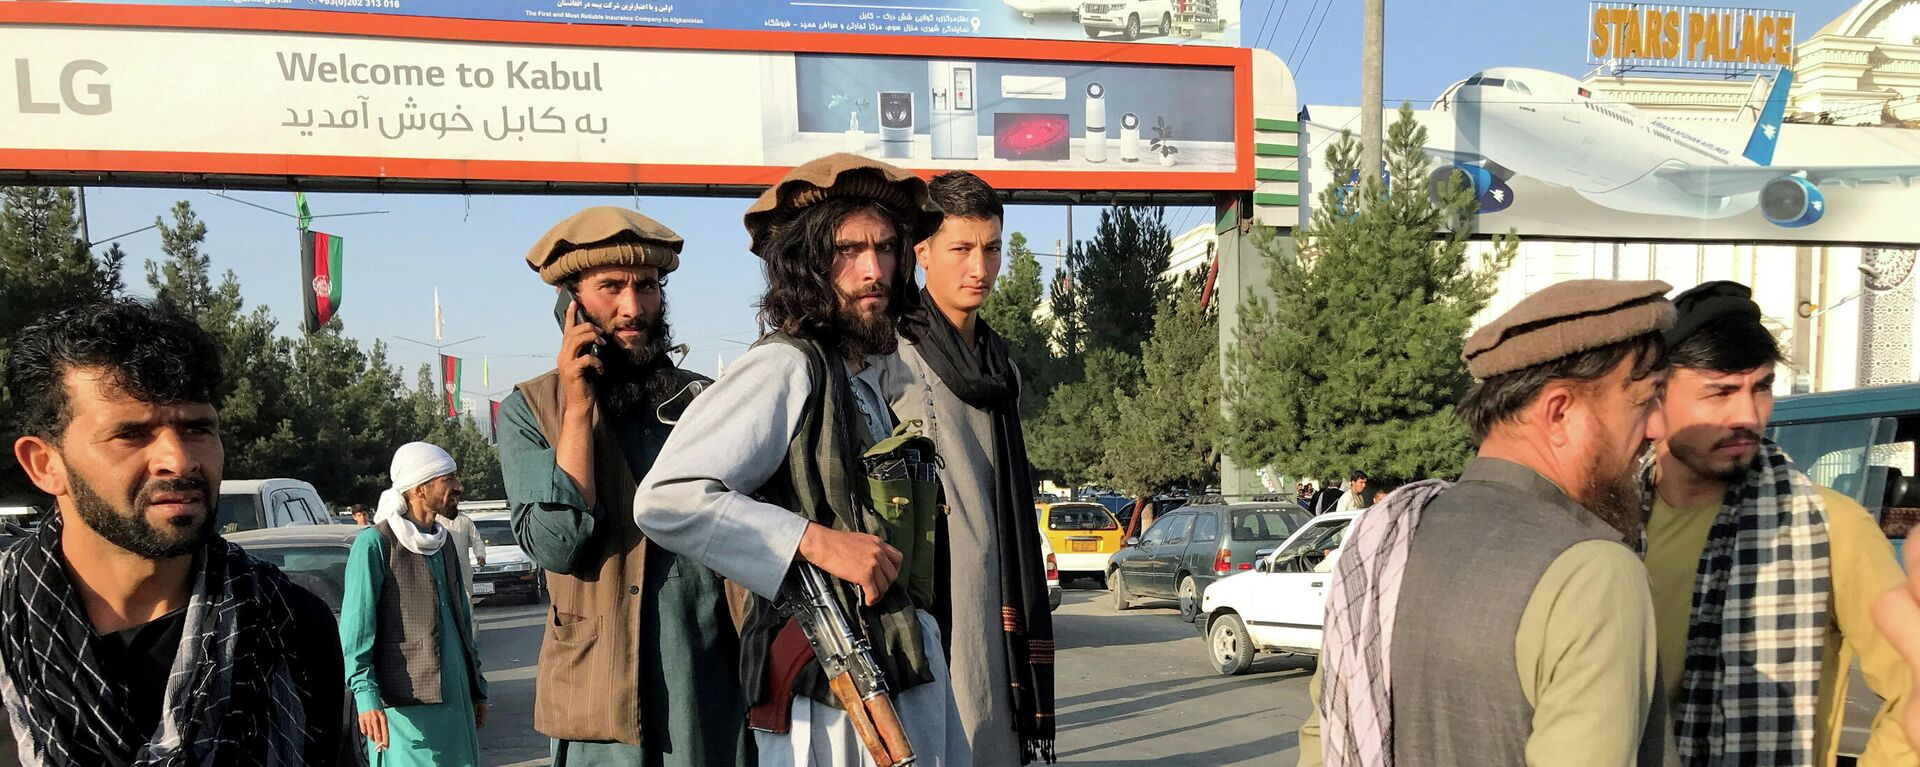 Los talibanes en Kabul, Afganistán - Sputnik Mundo, 1920, 21.08.2021